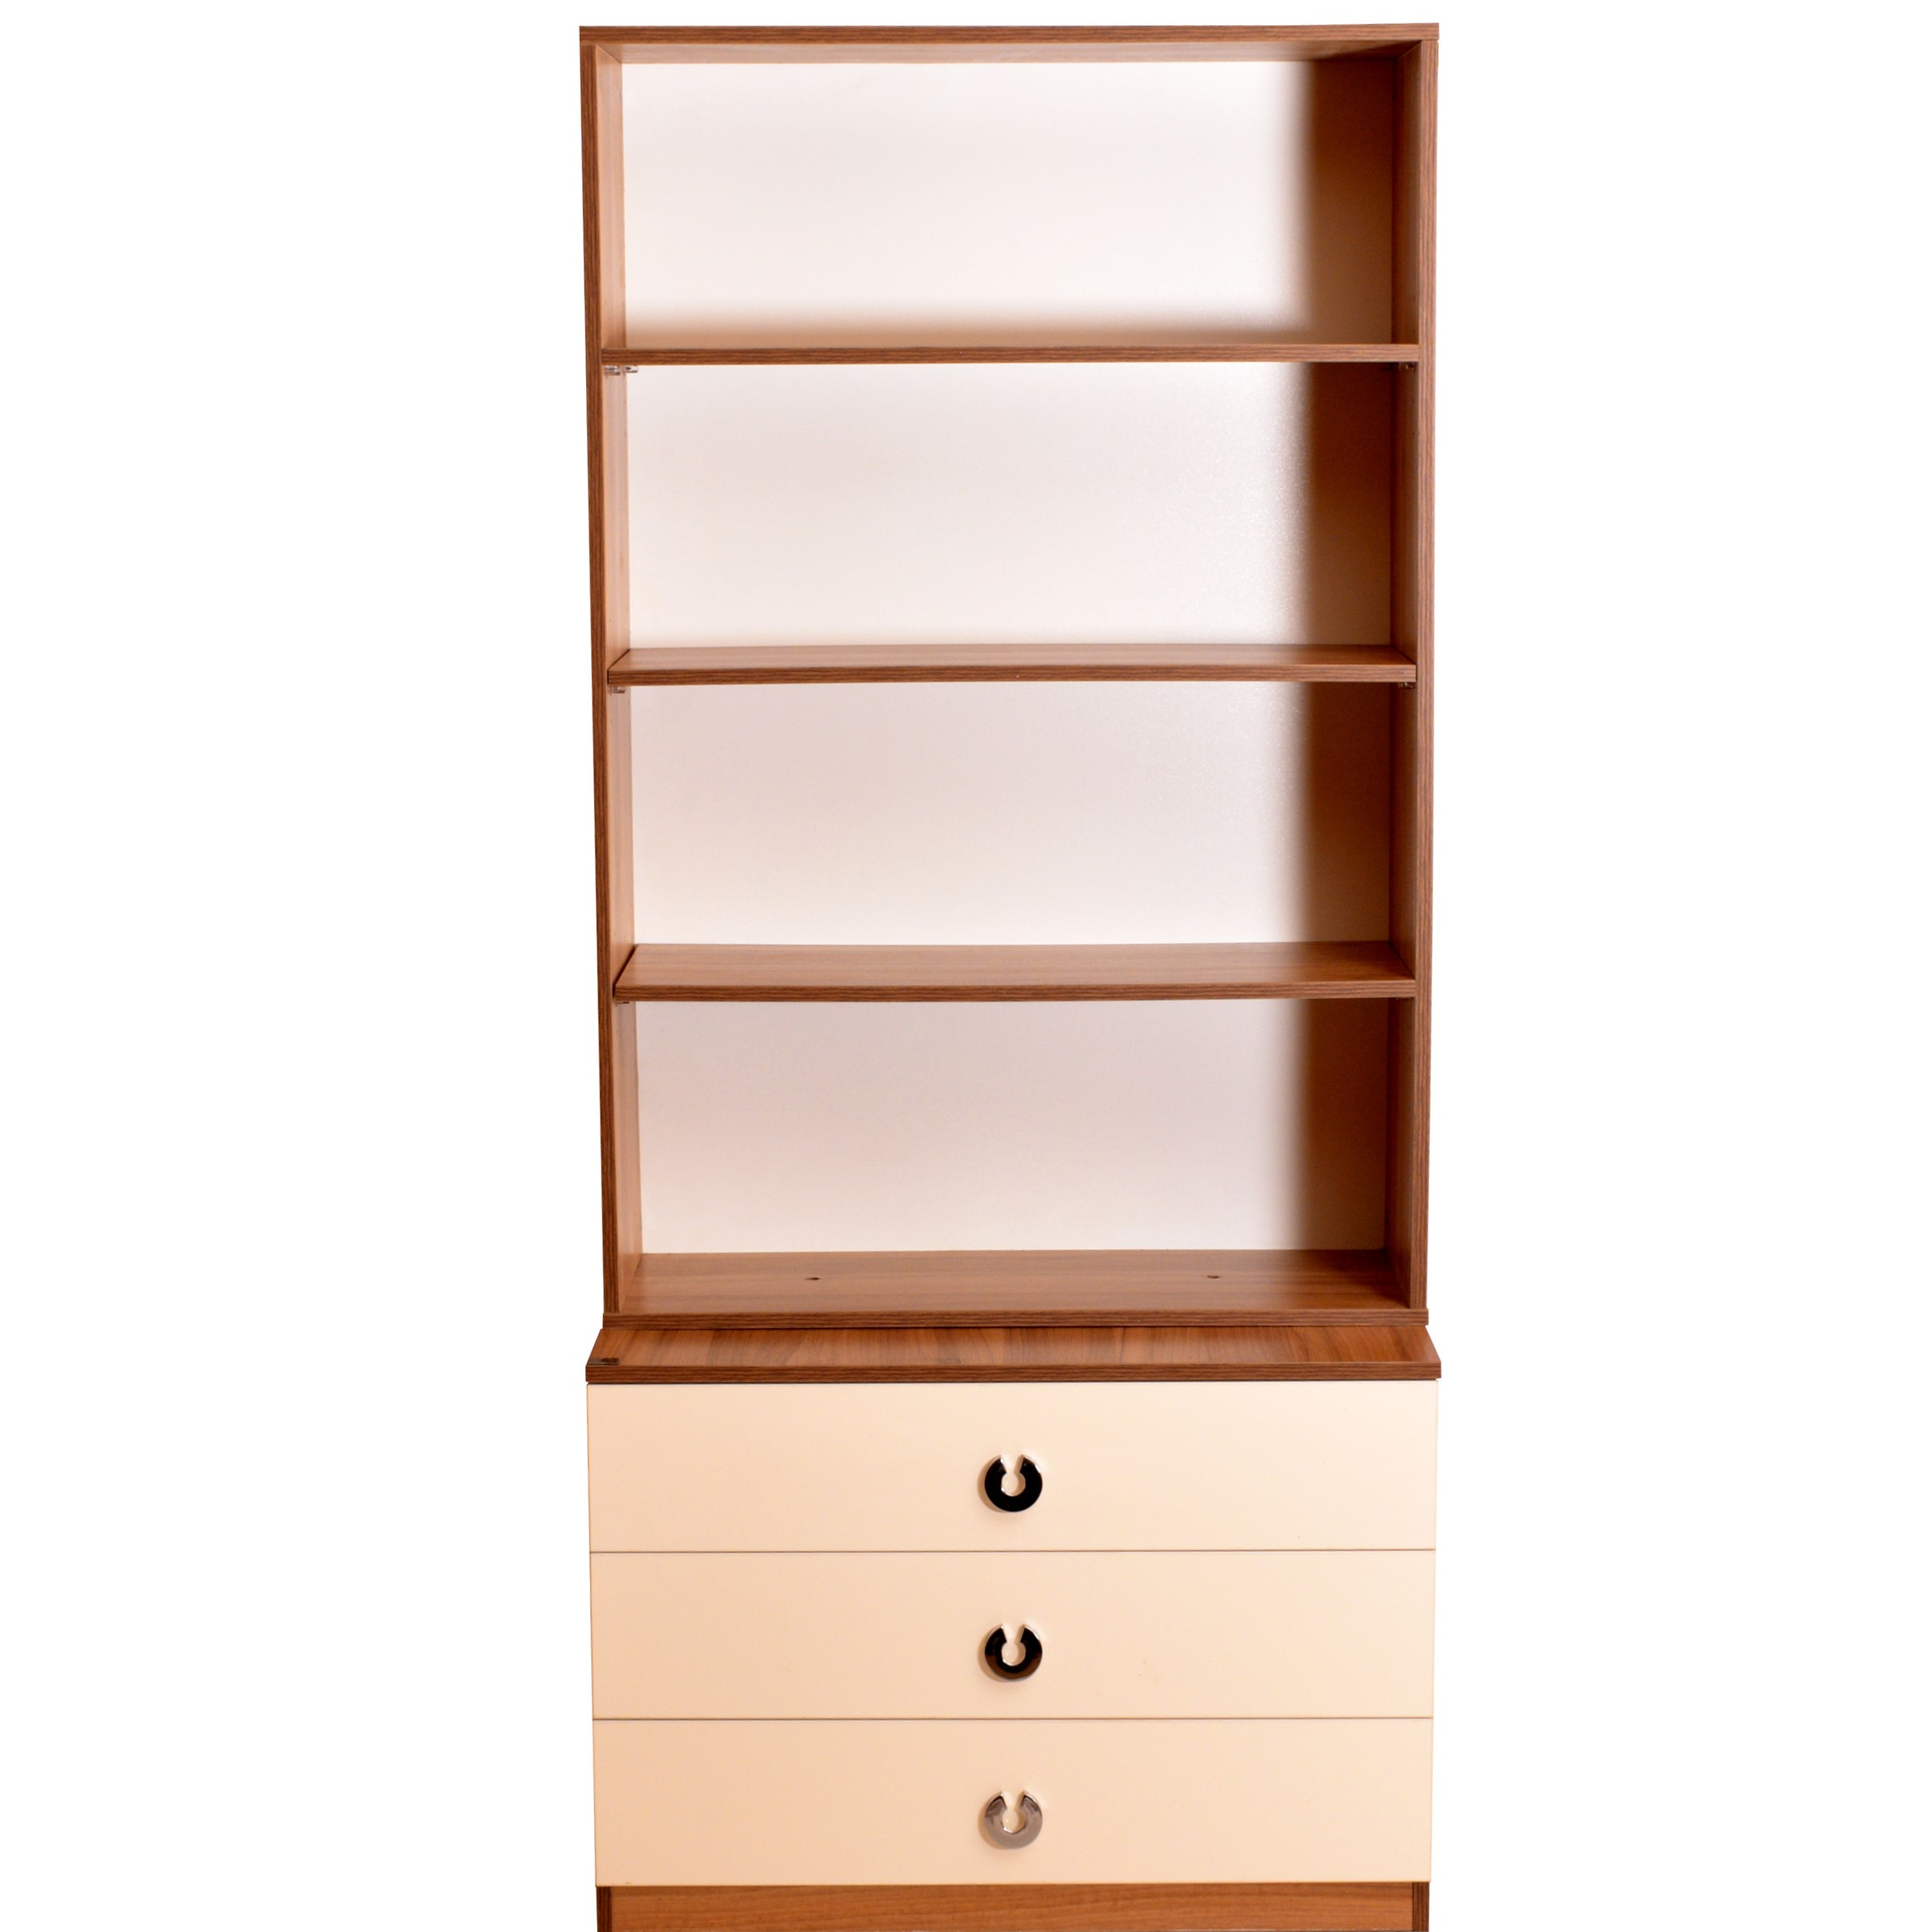 کتابخانه مدل jodak